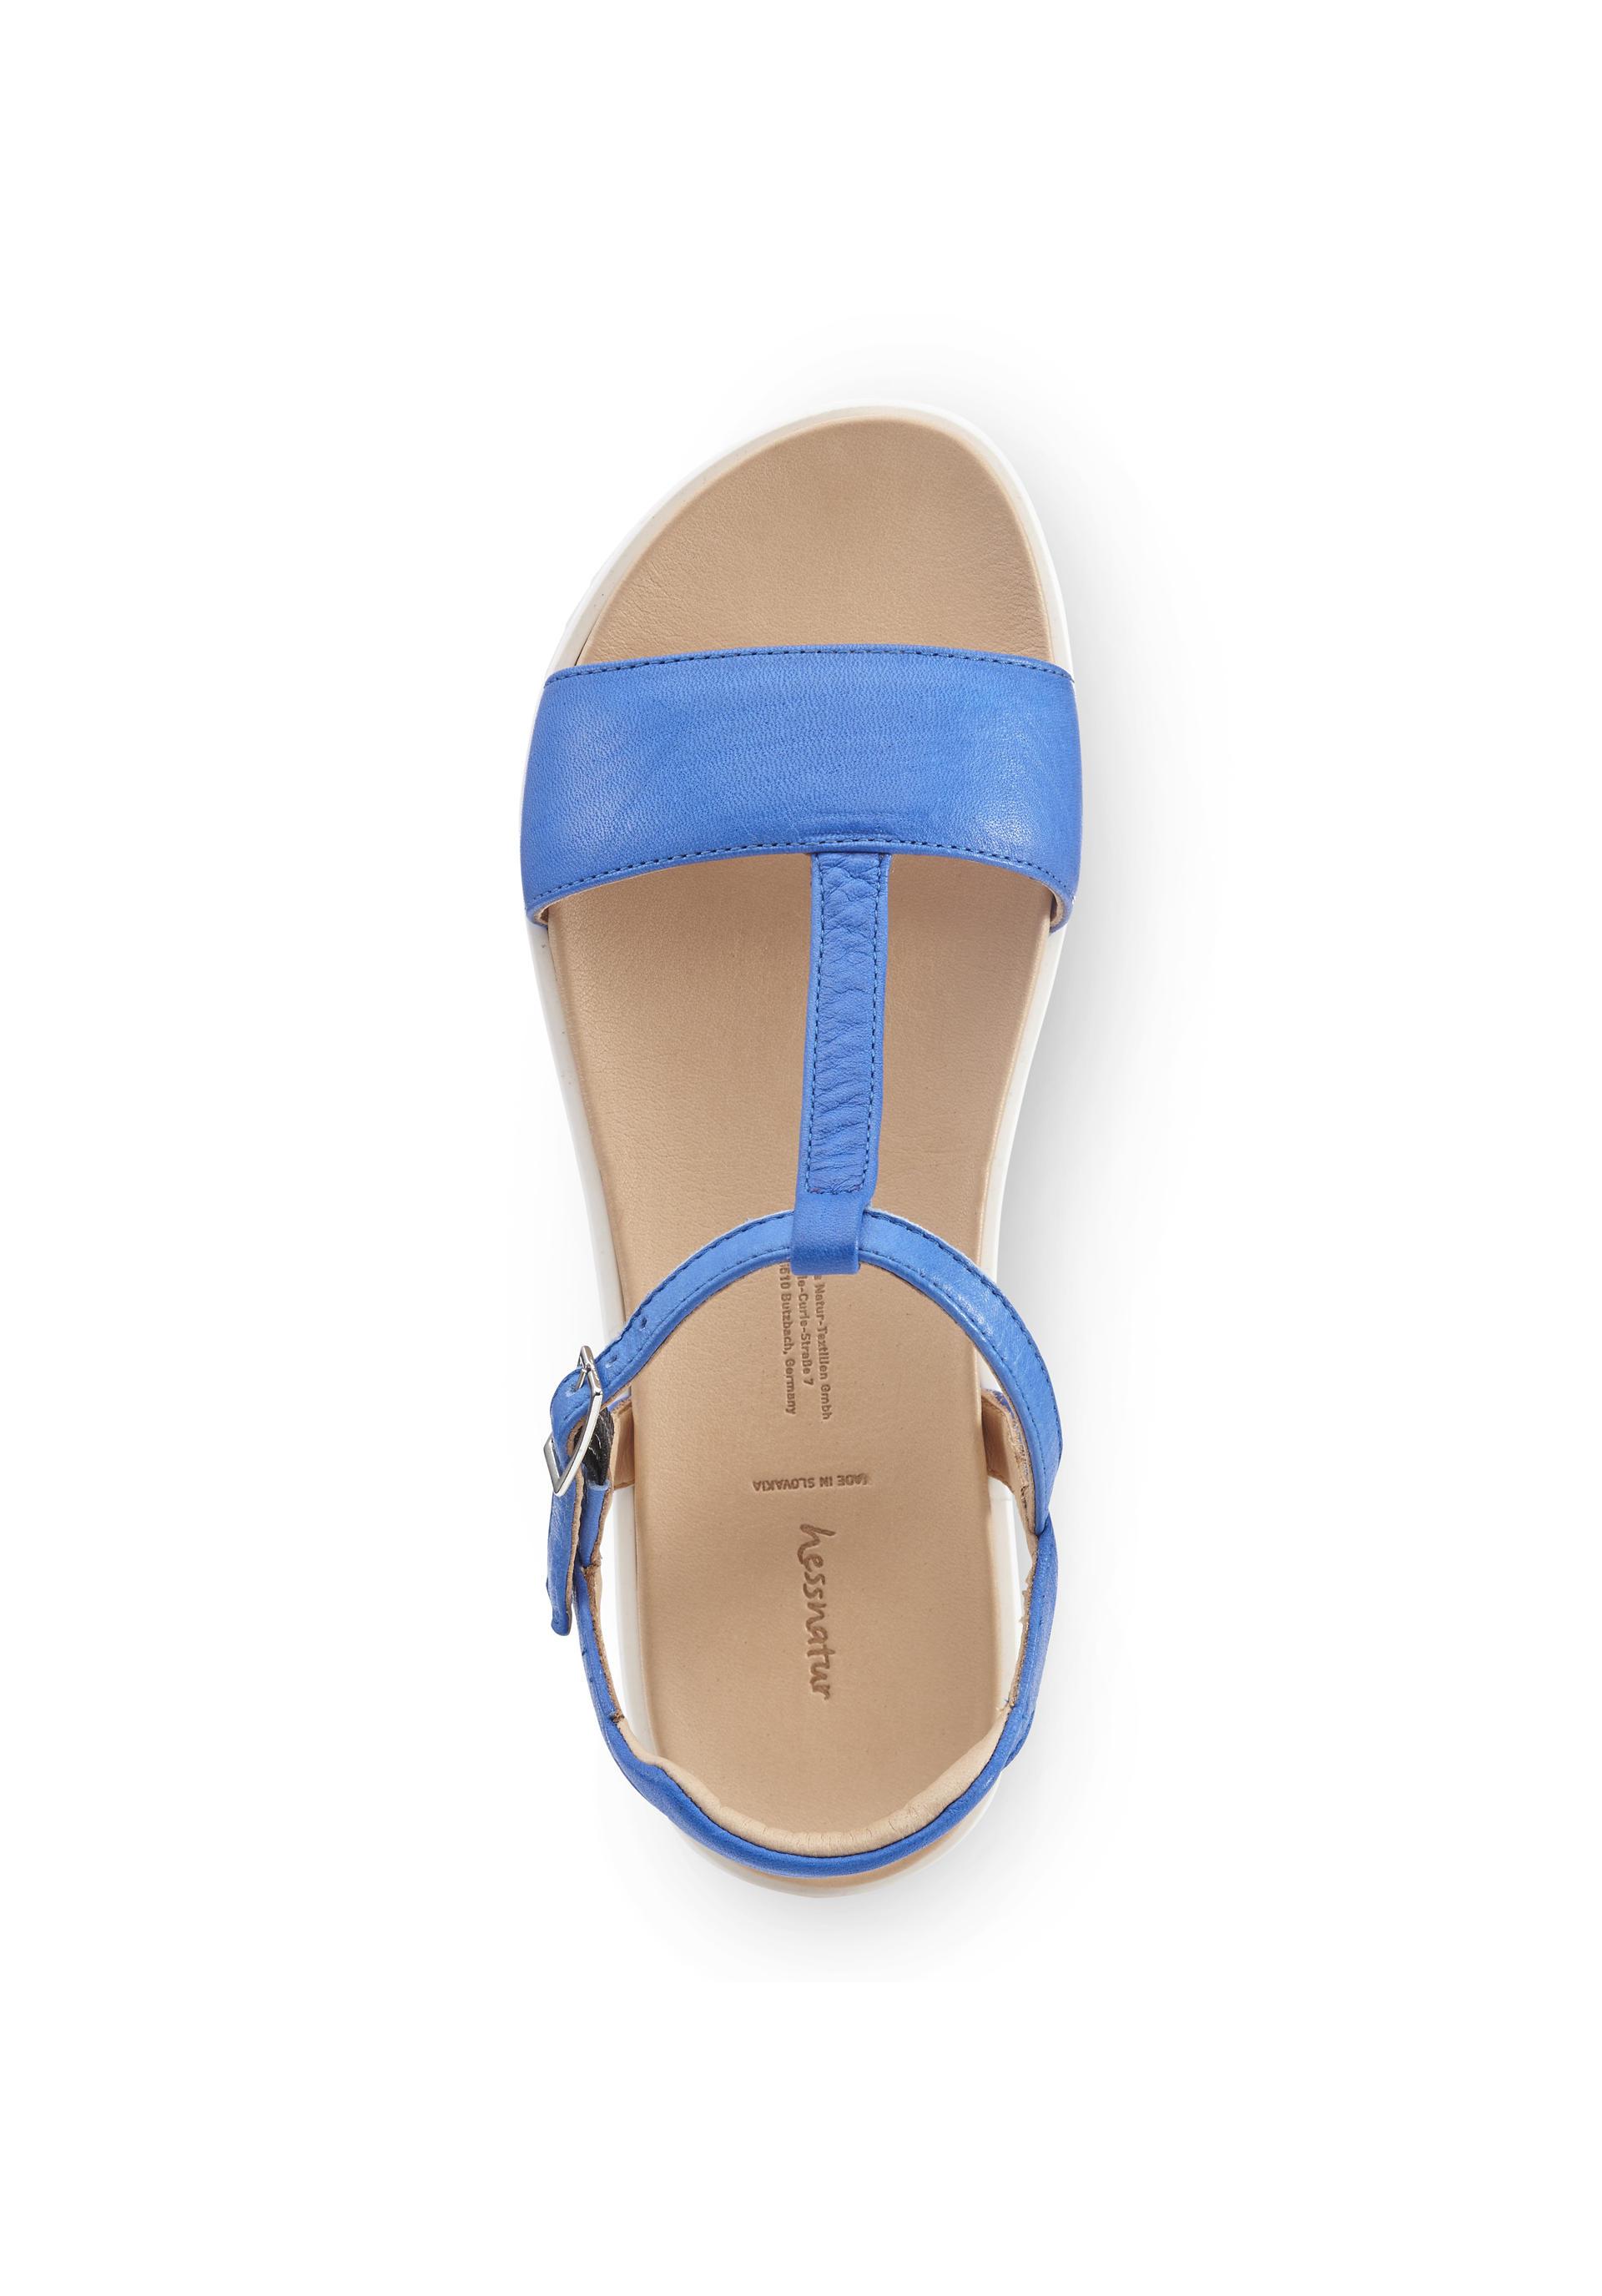 Damen Sandale aus Leder von hessnatur